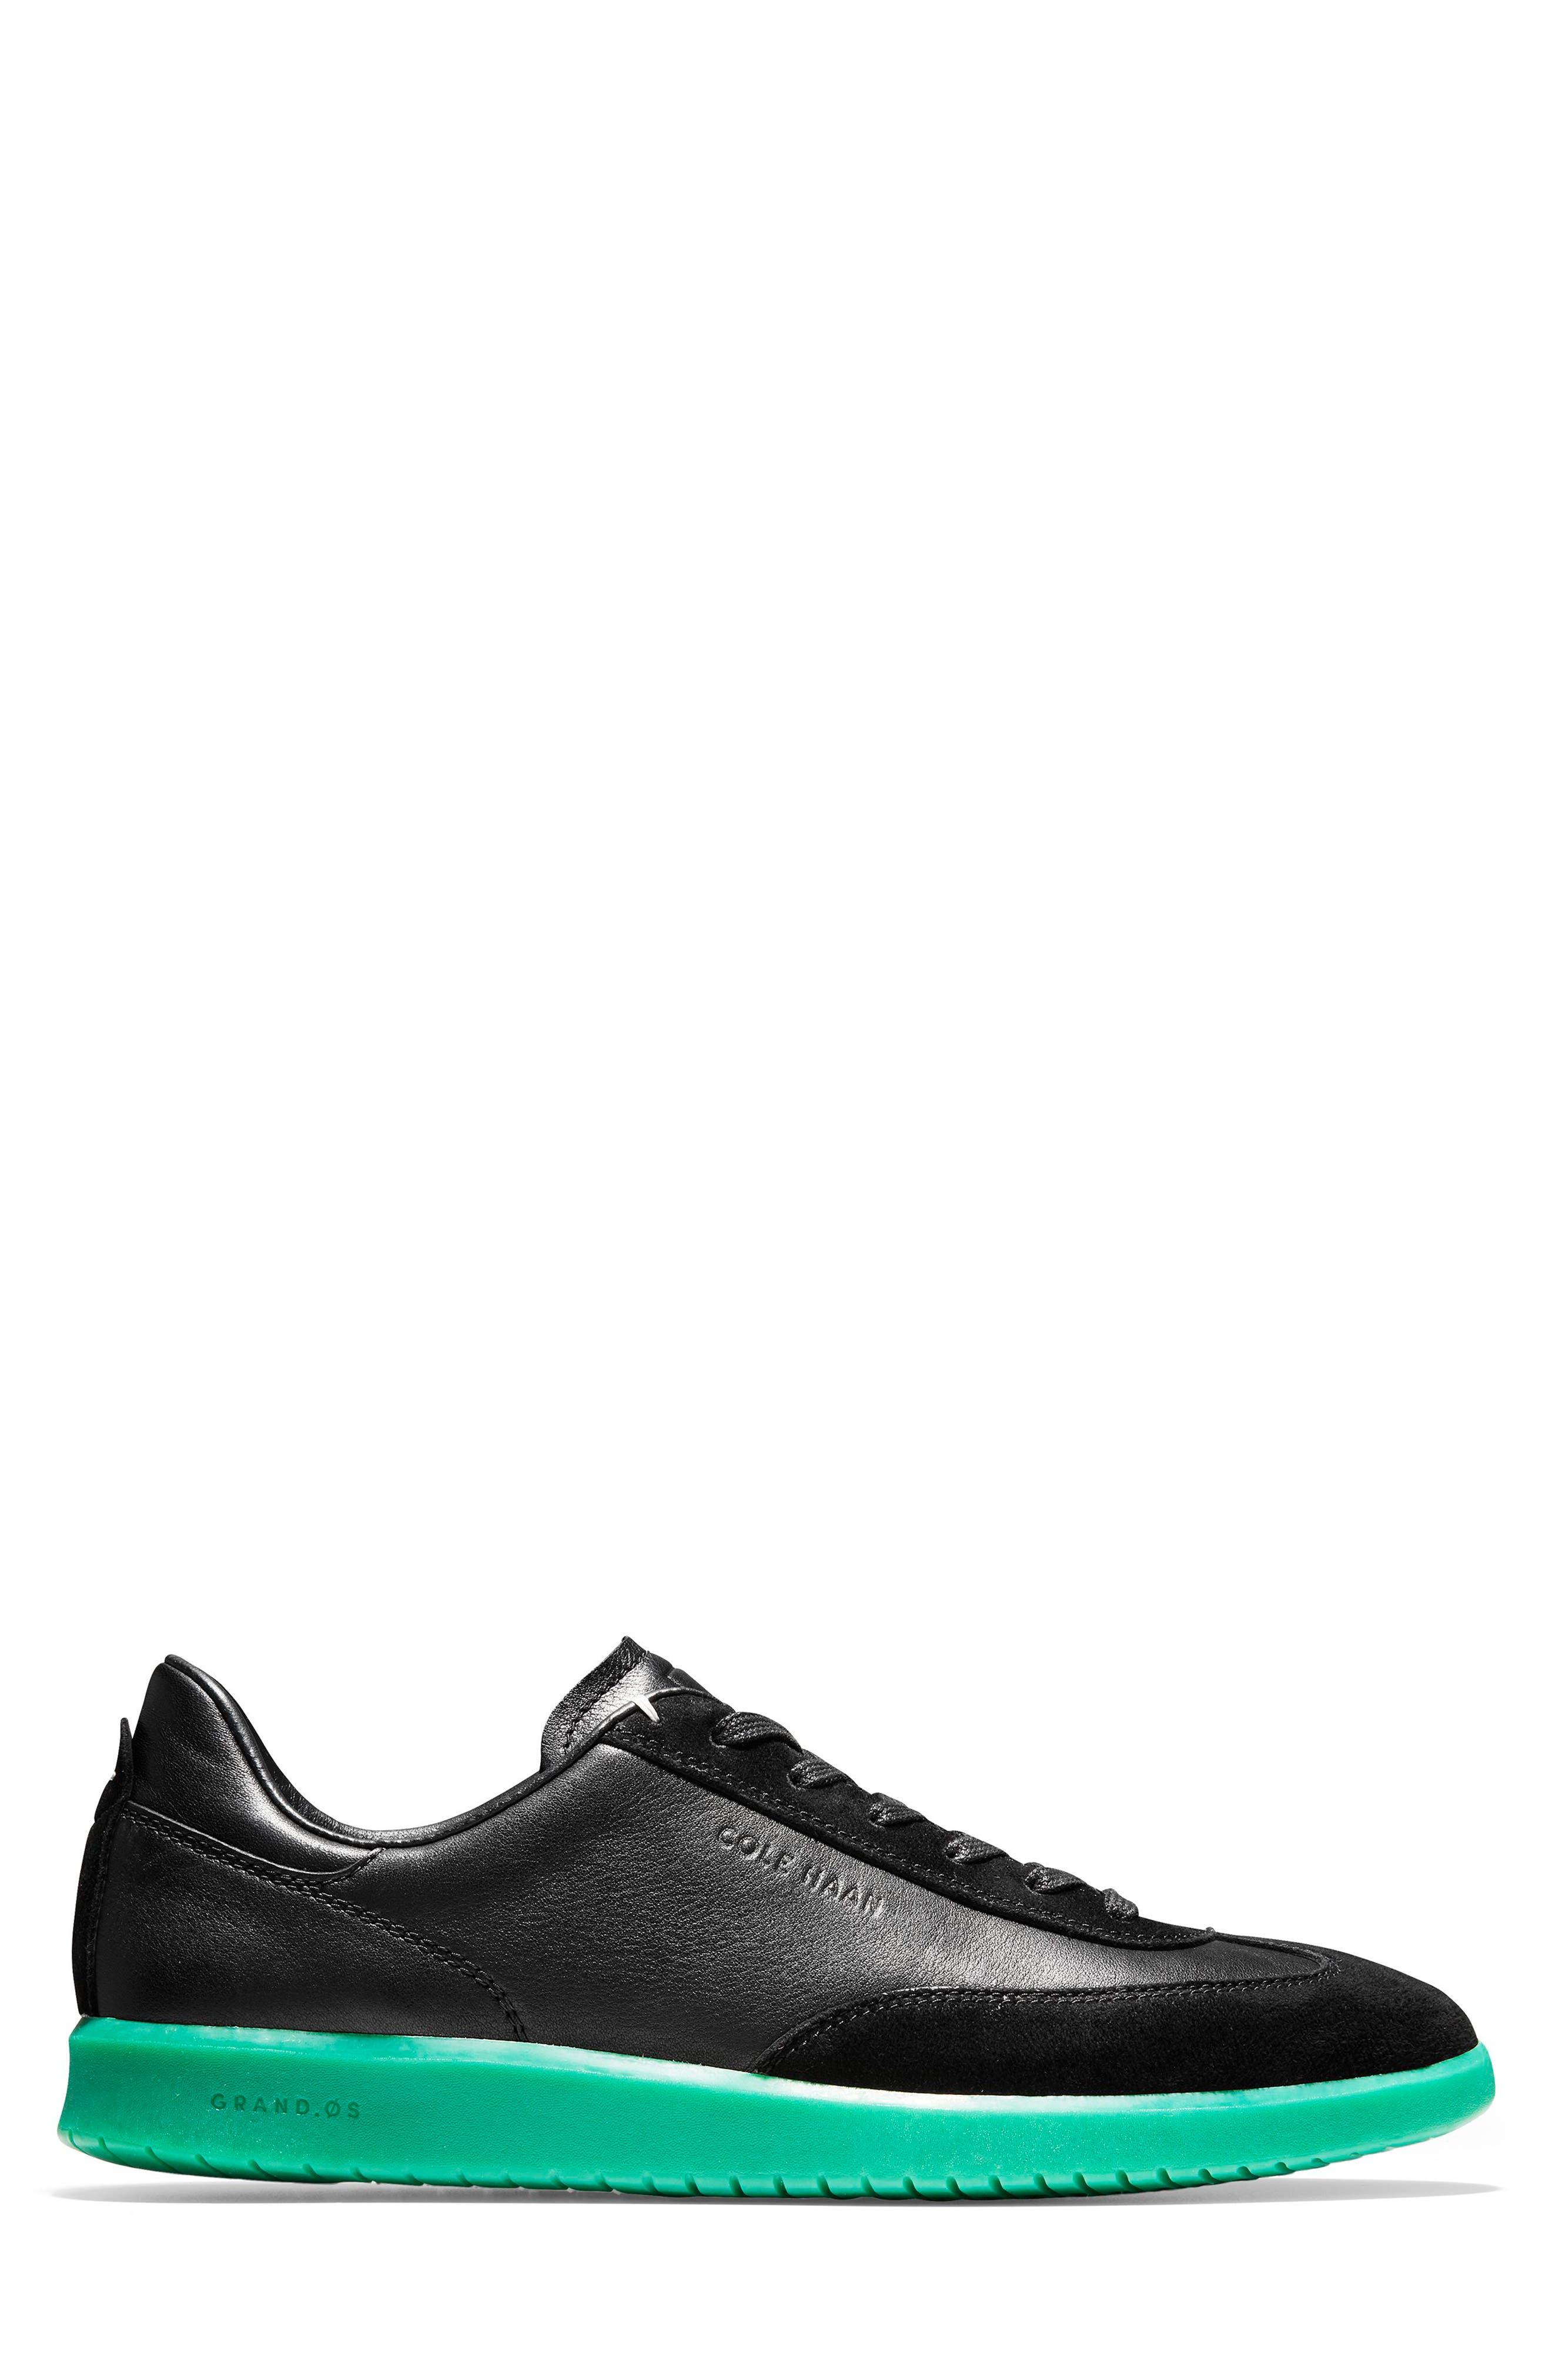 COLE HAAN, GrandPro Turf Sneaker, Alternate thumbnail 2, color, BLACK/ GREEN TRANSLUCENT